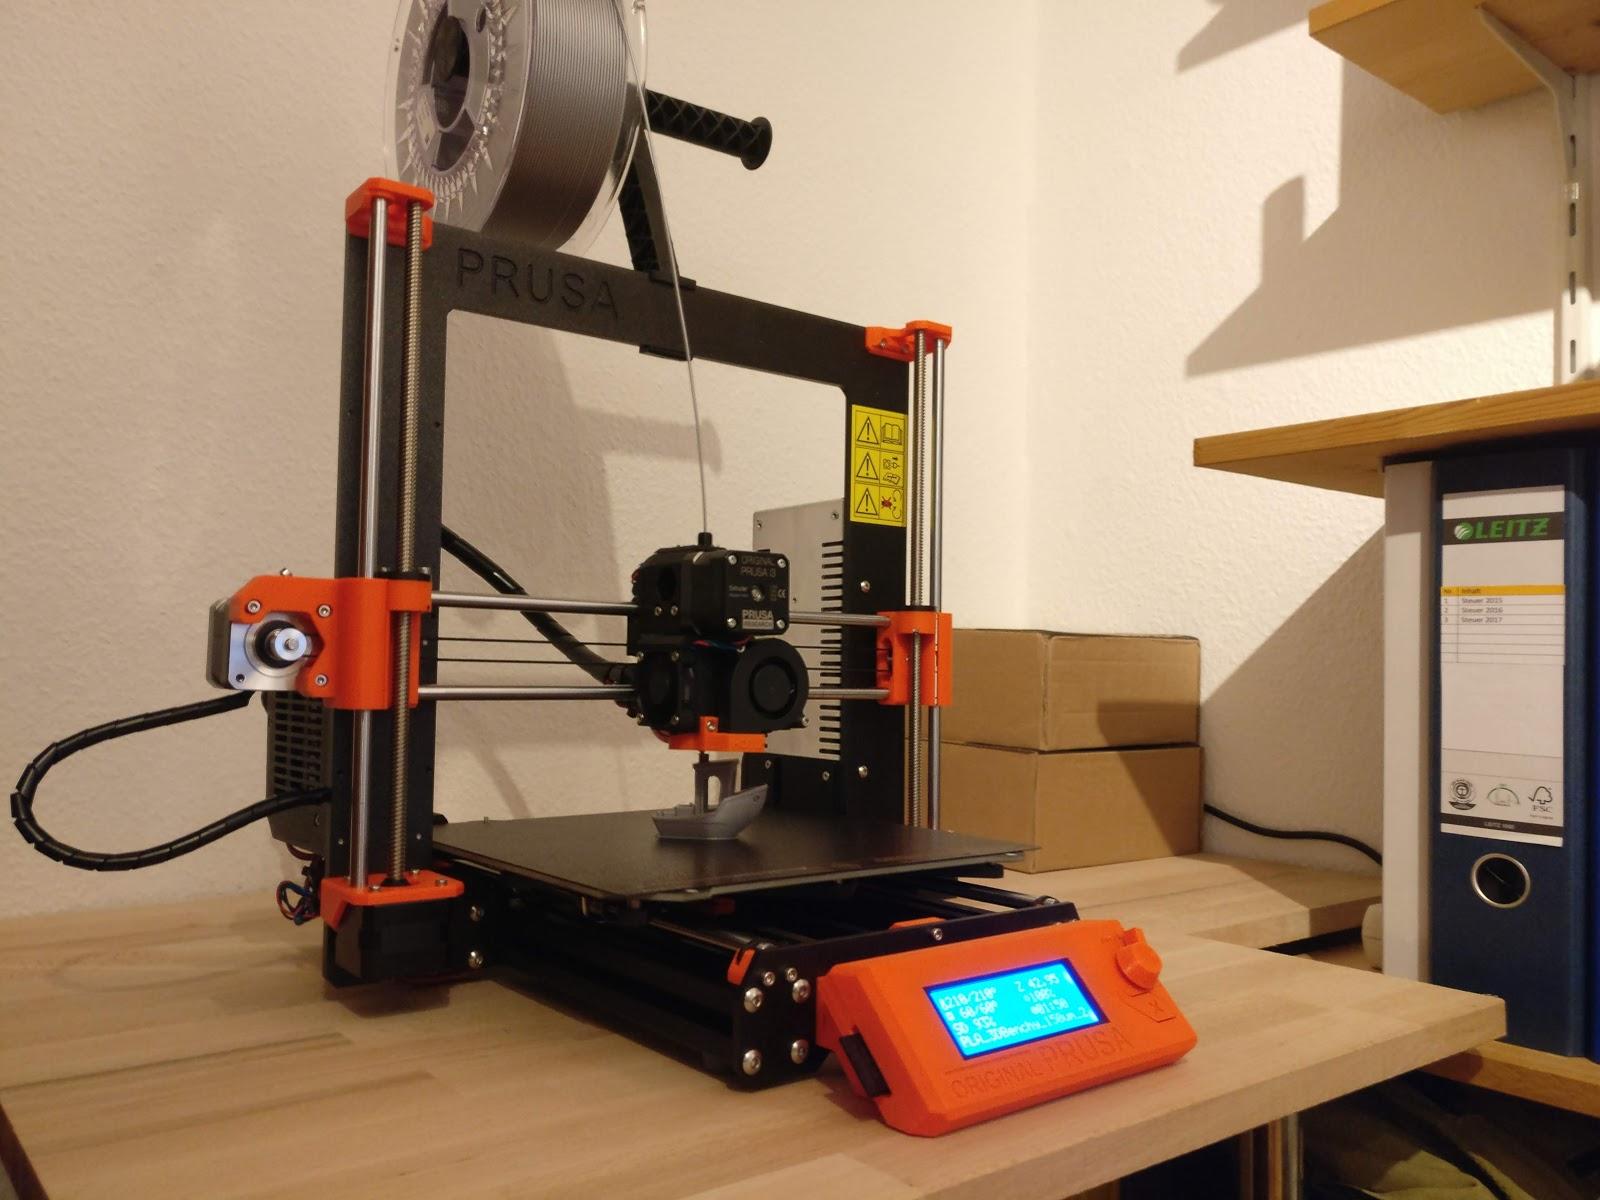 jendit: Assembling a 3D Printer - The Original Prusa i3 MK3